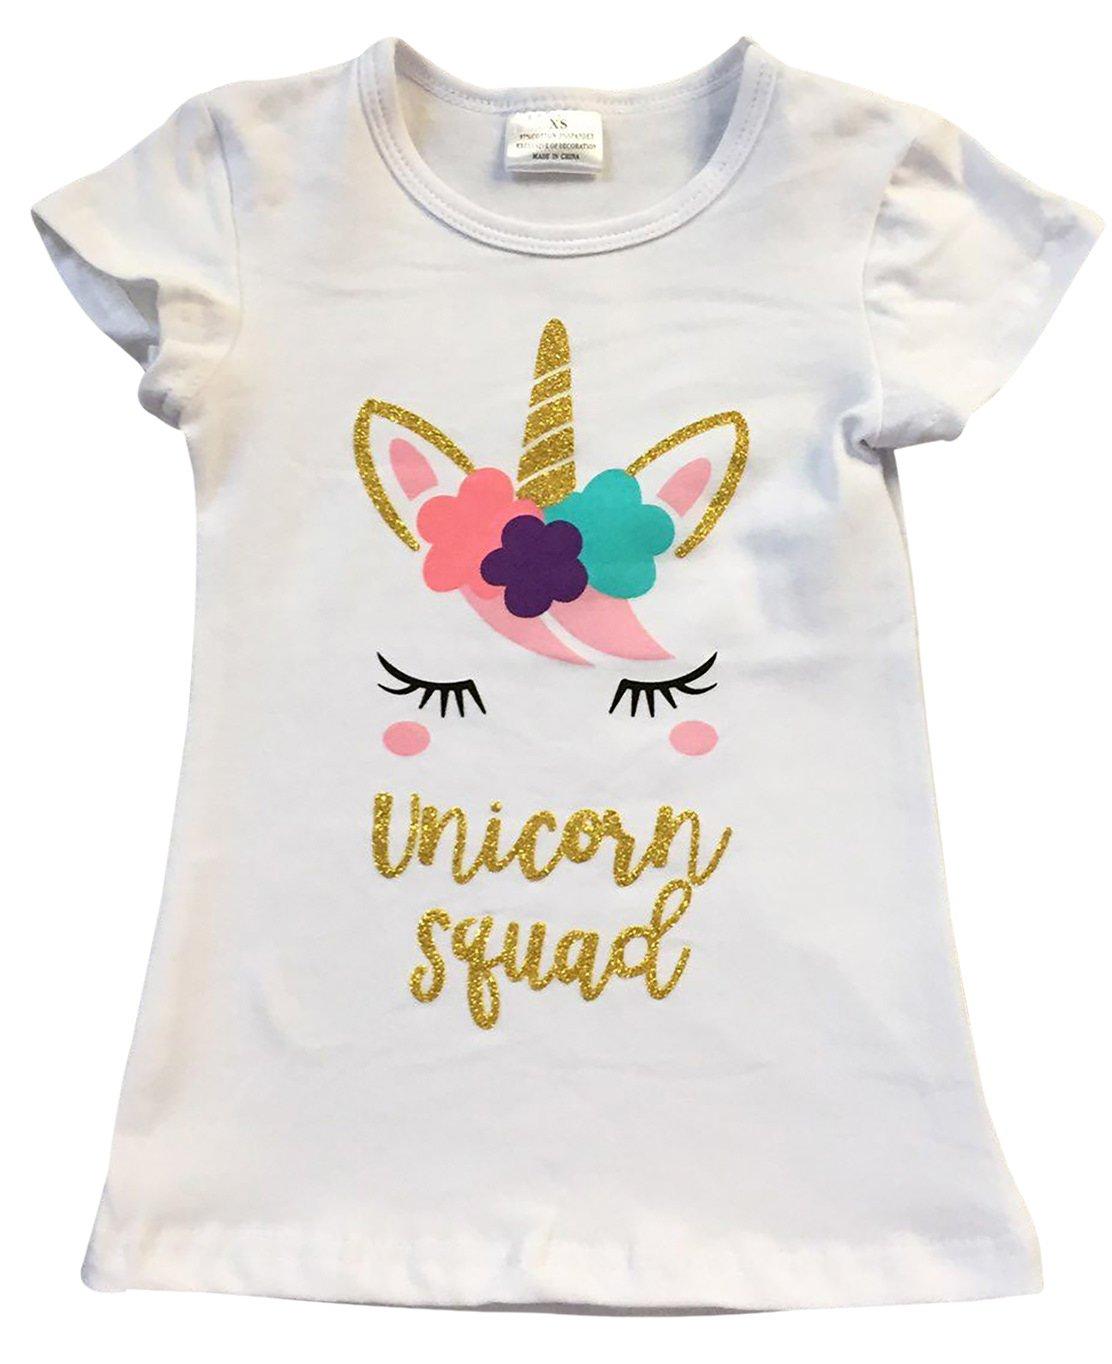 Toddler Girls Short Sleeve Glitter Unicorn Squad Cotton Summer Top T Shirt Tee White 2T XS (P201431P)